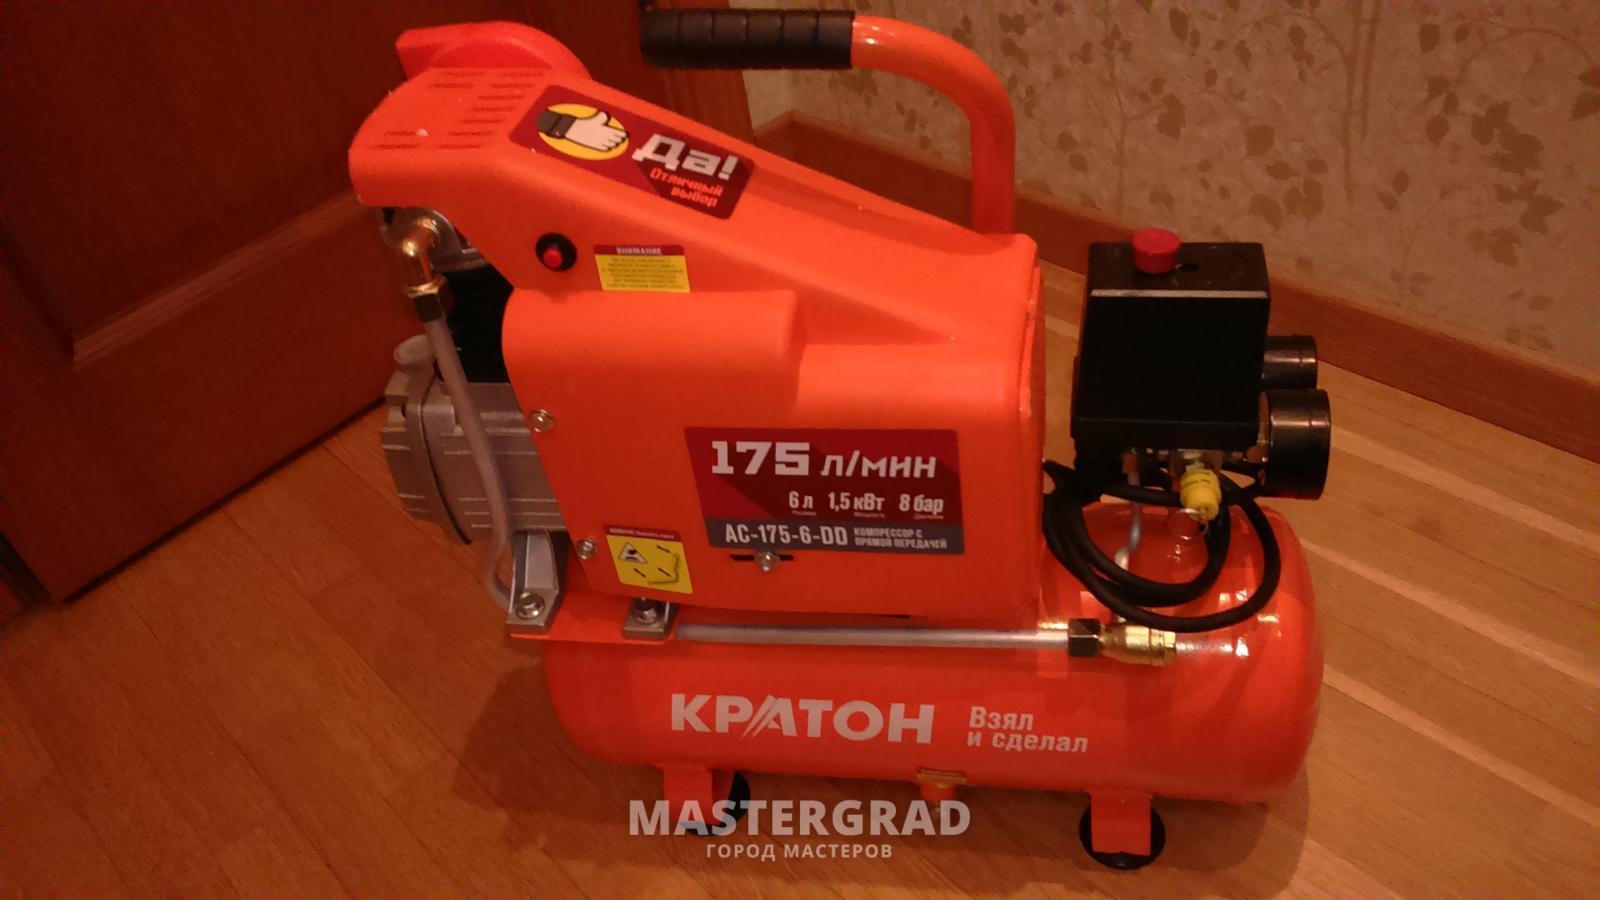 Схема компрессора кратон 350-40